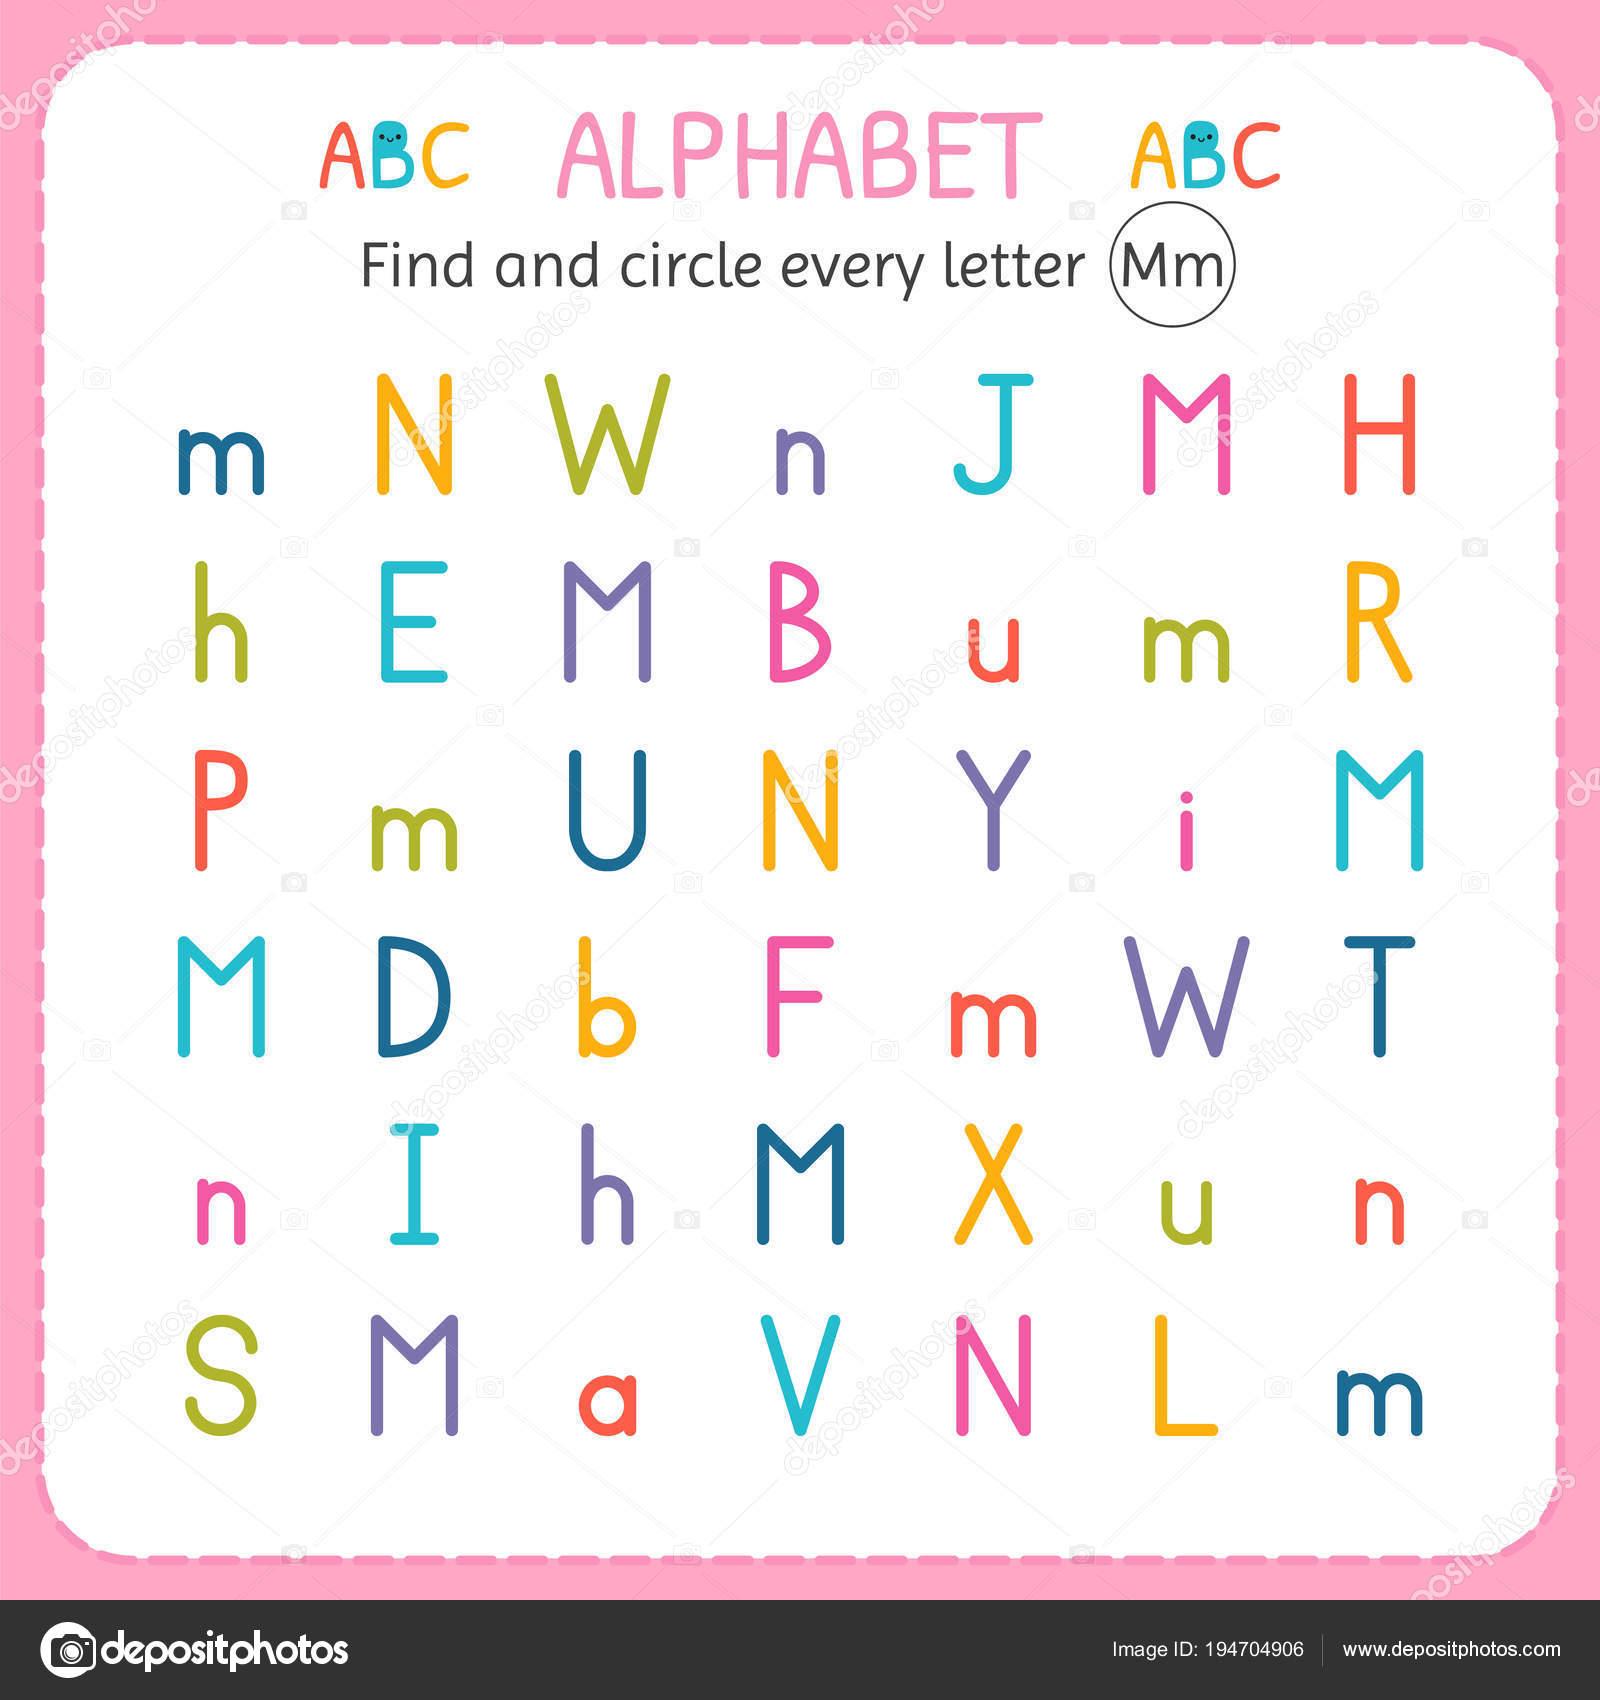 Find And Circle Every Letter M. Worksheet For Kindergarten with regard to Letter M Worksheets For Kinder